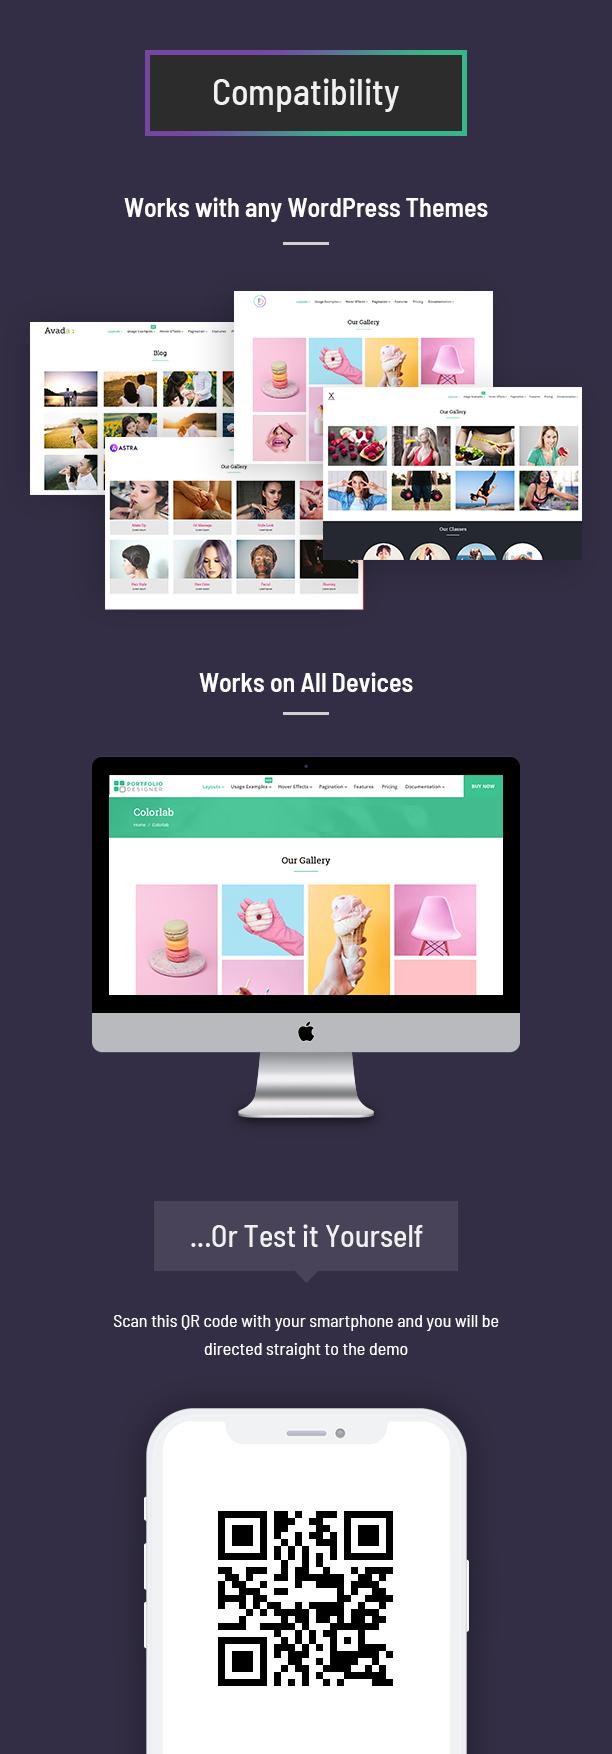 Portfolio Designer device compatibility